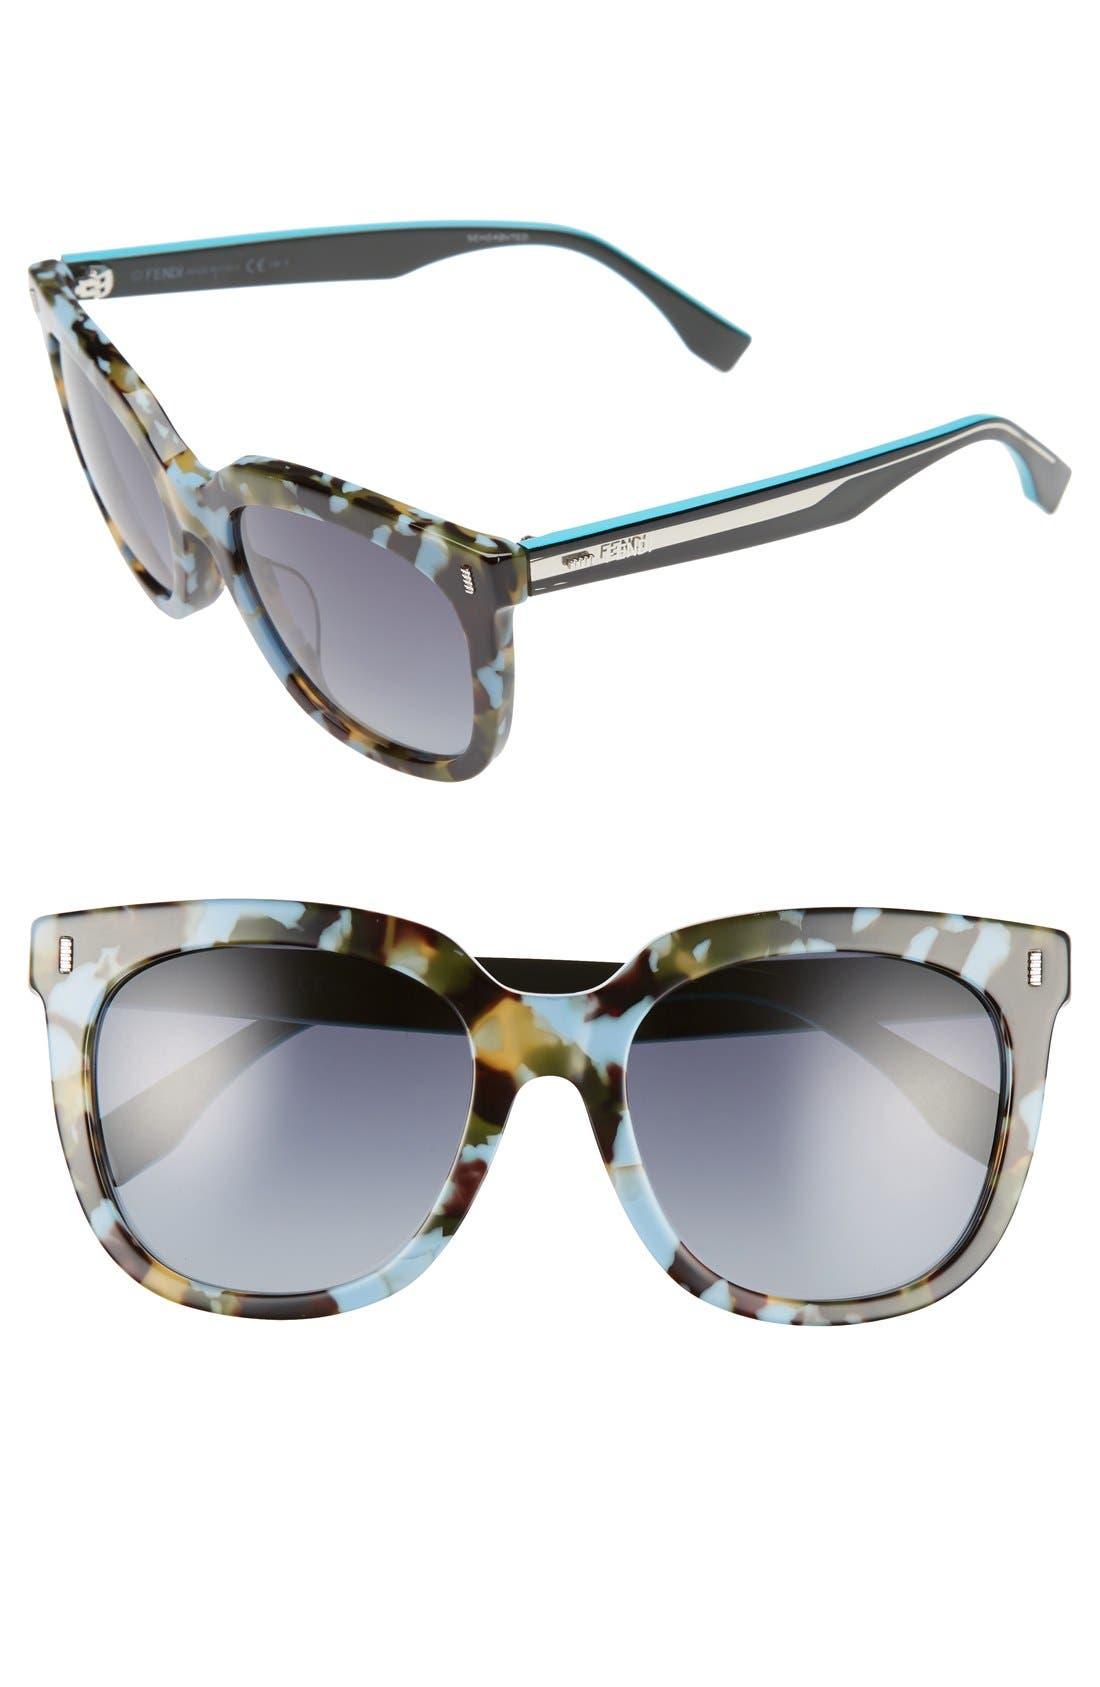 Alternate Image 1 Selected - Fendi 54mm Retro Sunglasses